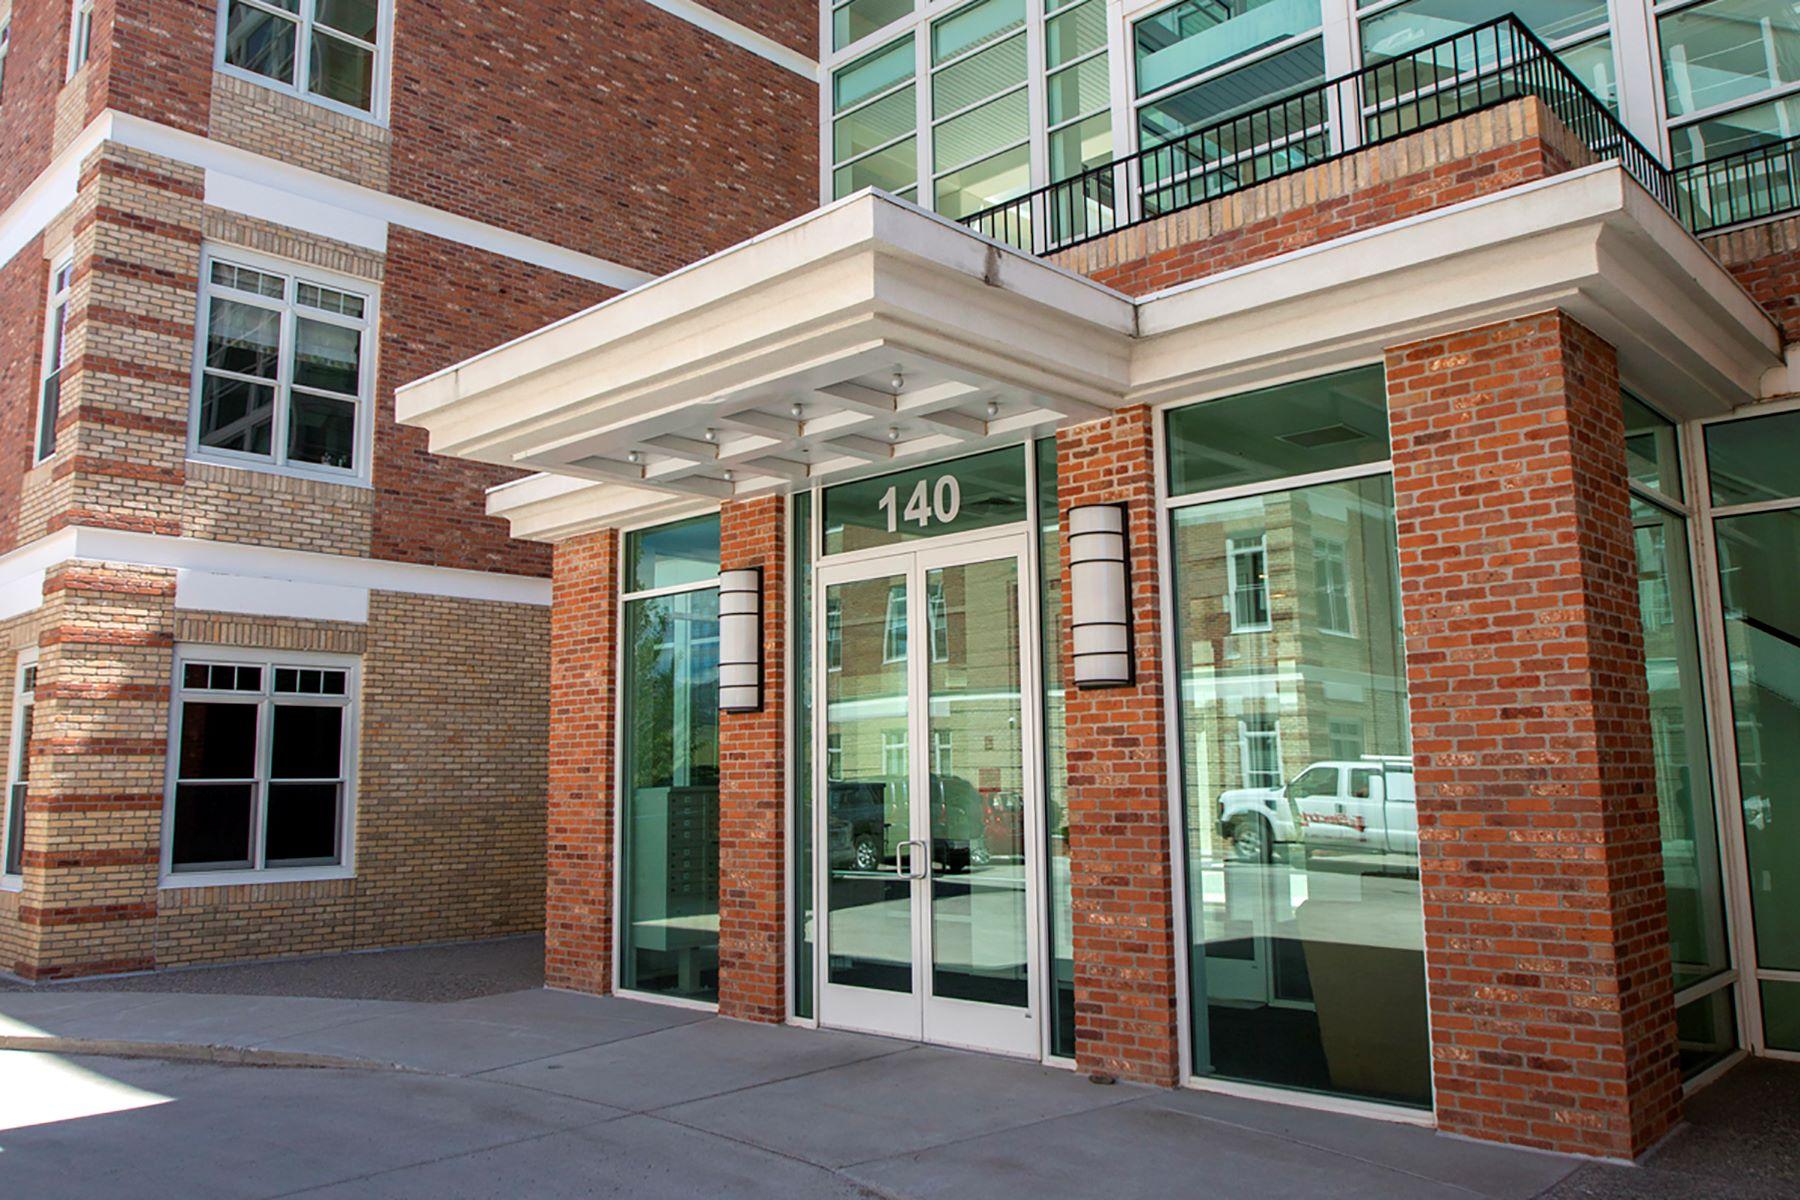 Condominiums for Sale at Village Condo 140 Village Crossing #2G Bozeman, Montana 59715 United States